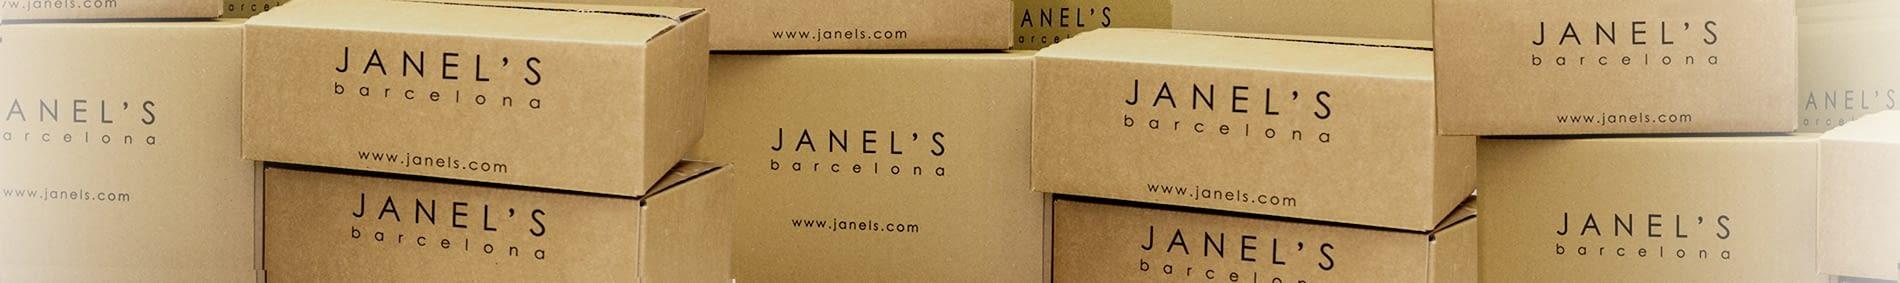 Carrusel-Servicios-Janels